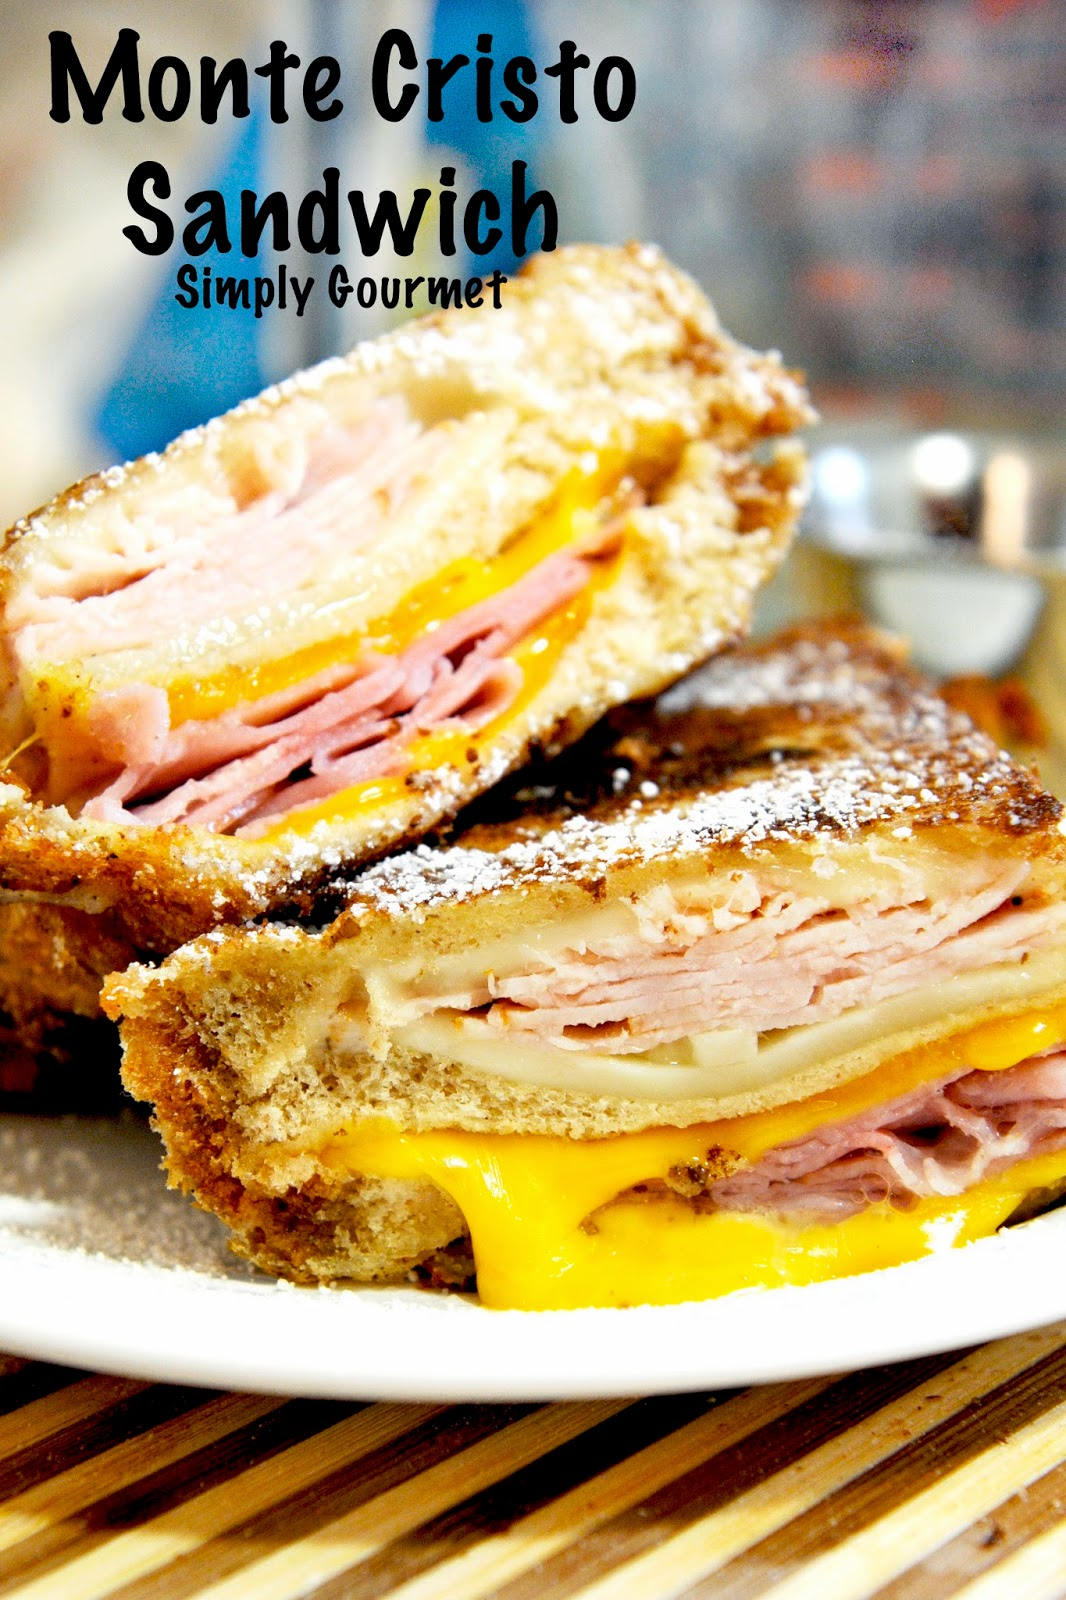 Simply Gourmet: Monte Cristo Sandwich